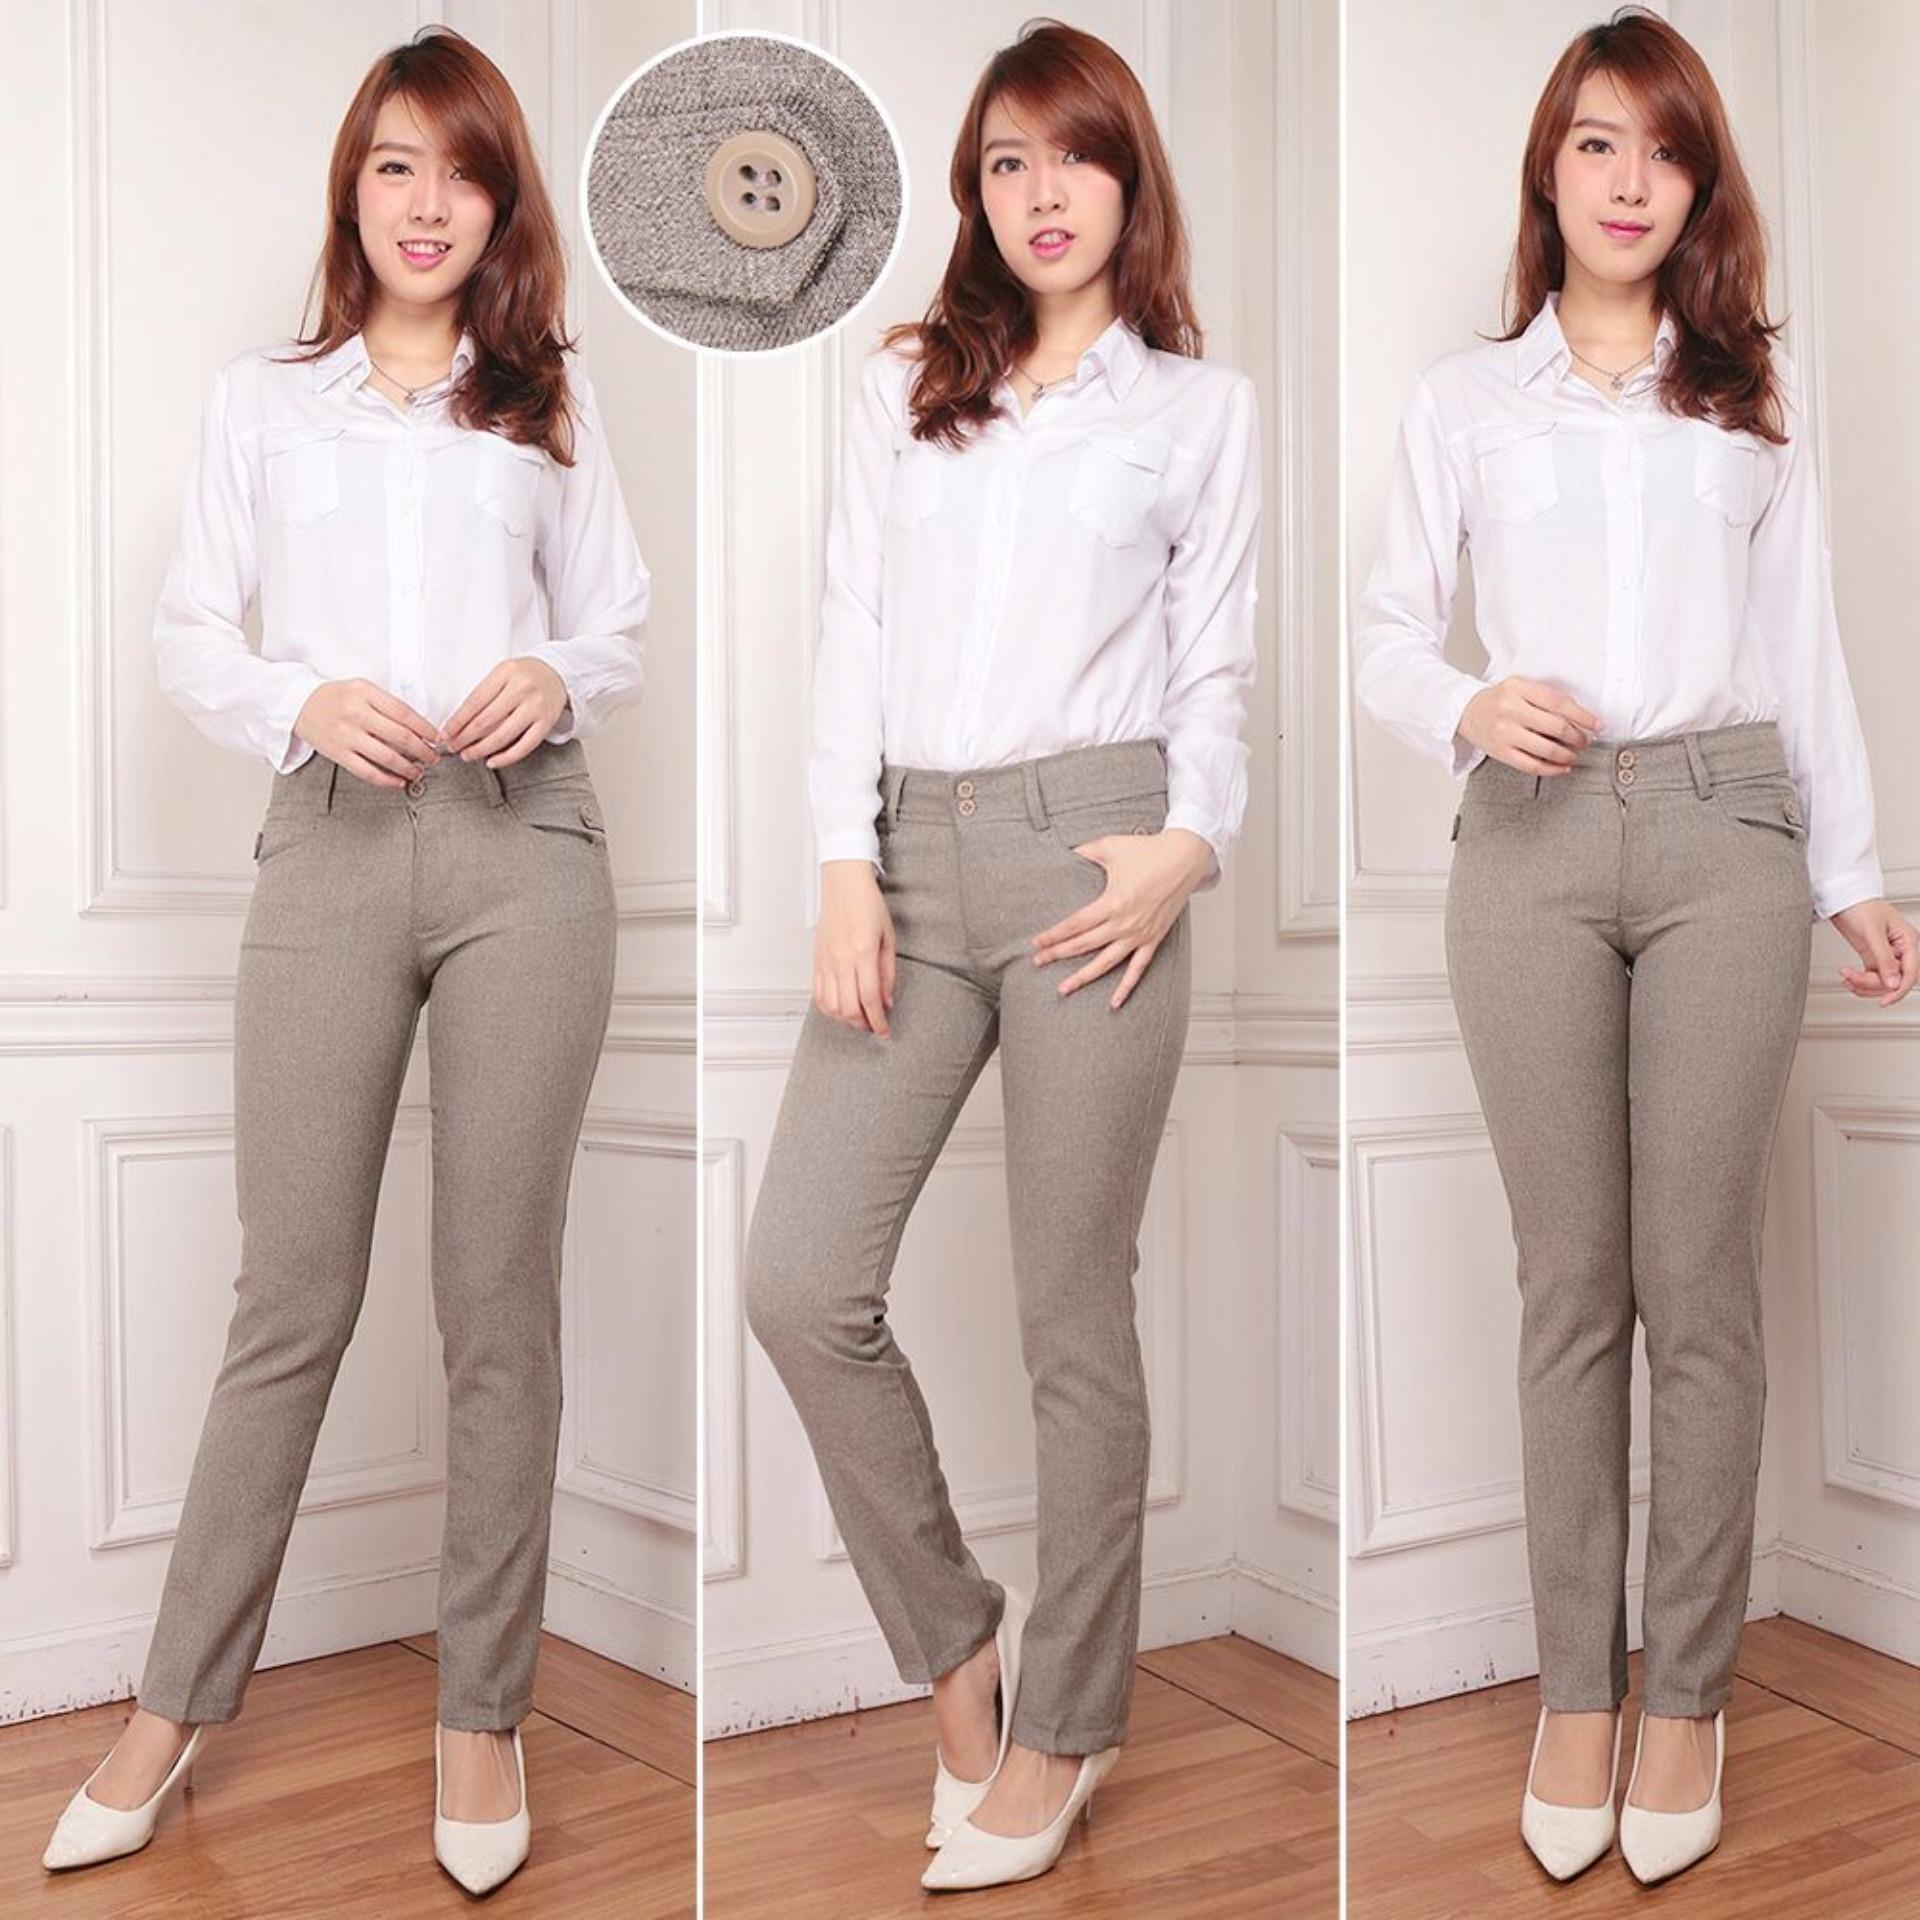 Spesifikasi De Most Celana Bahan Wanita Jahitan Rapi Murah Cream Beserta Harganya